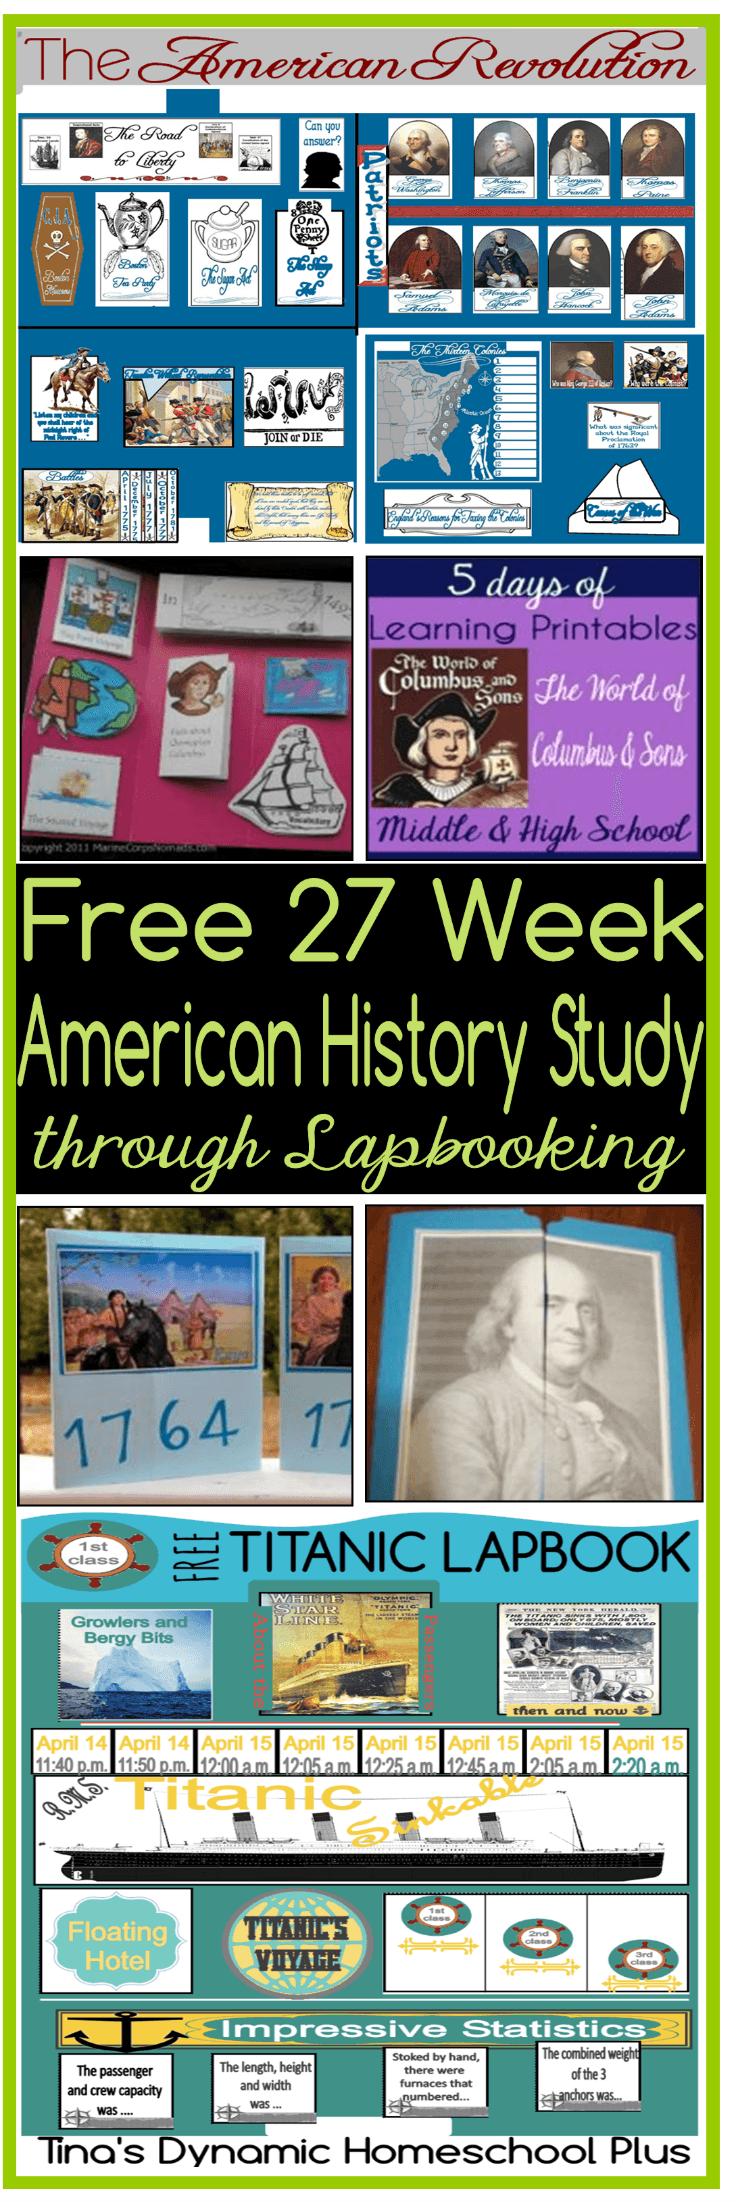 Free-27-Week-American-History-Study-through-Lapbooking-In-Chronological-Order-@-Tinas-Dynamic-Homeschool-Plus